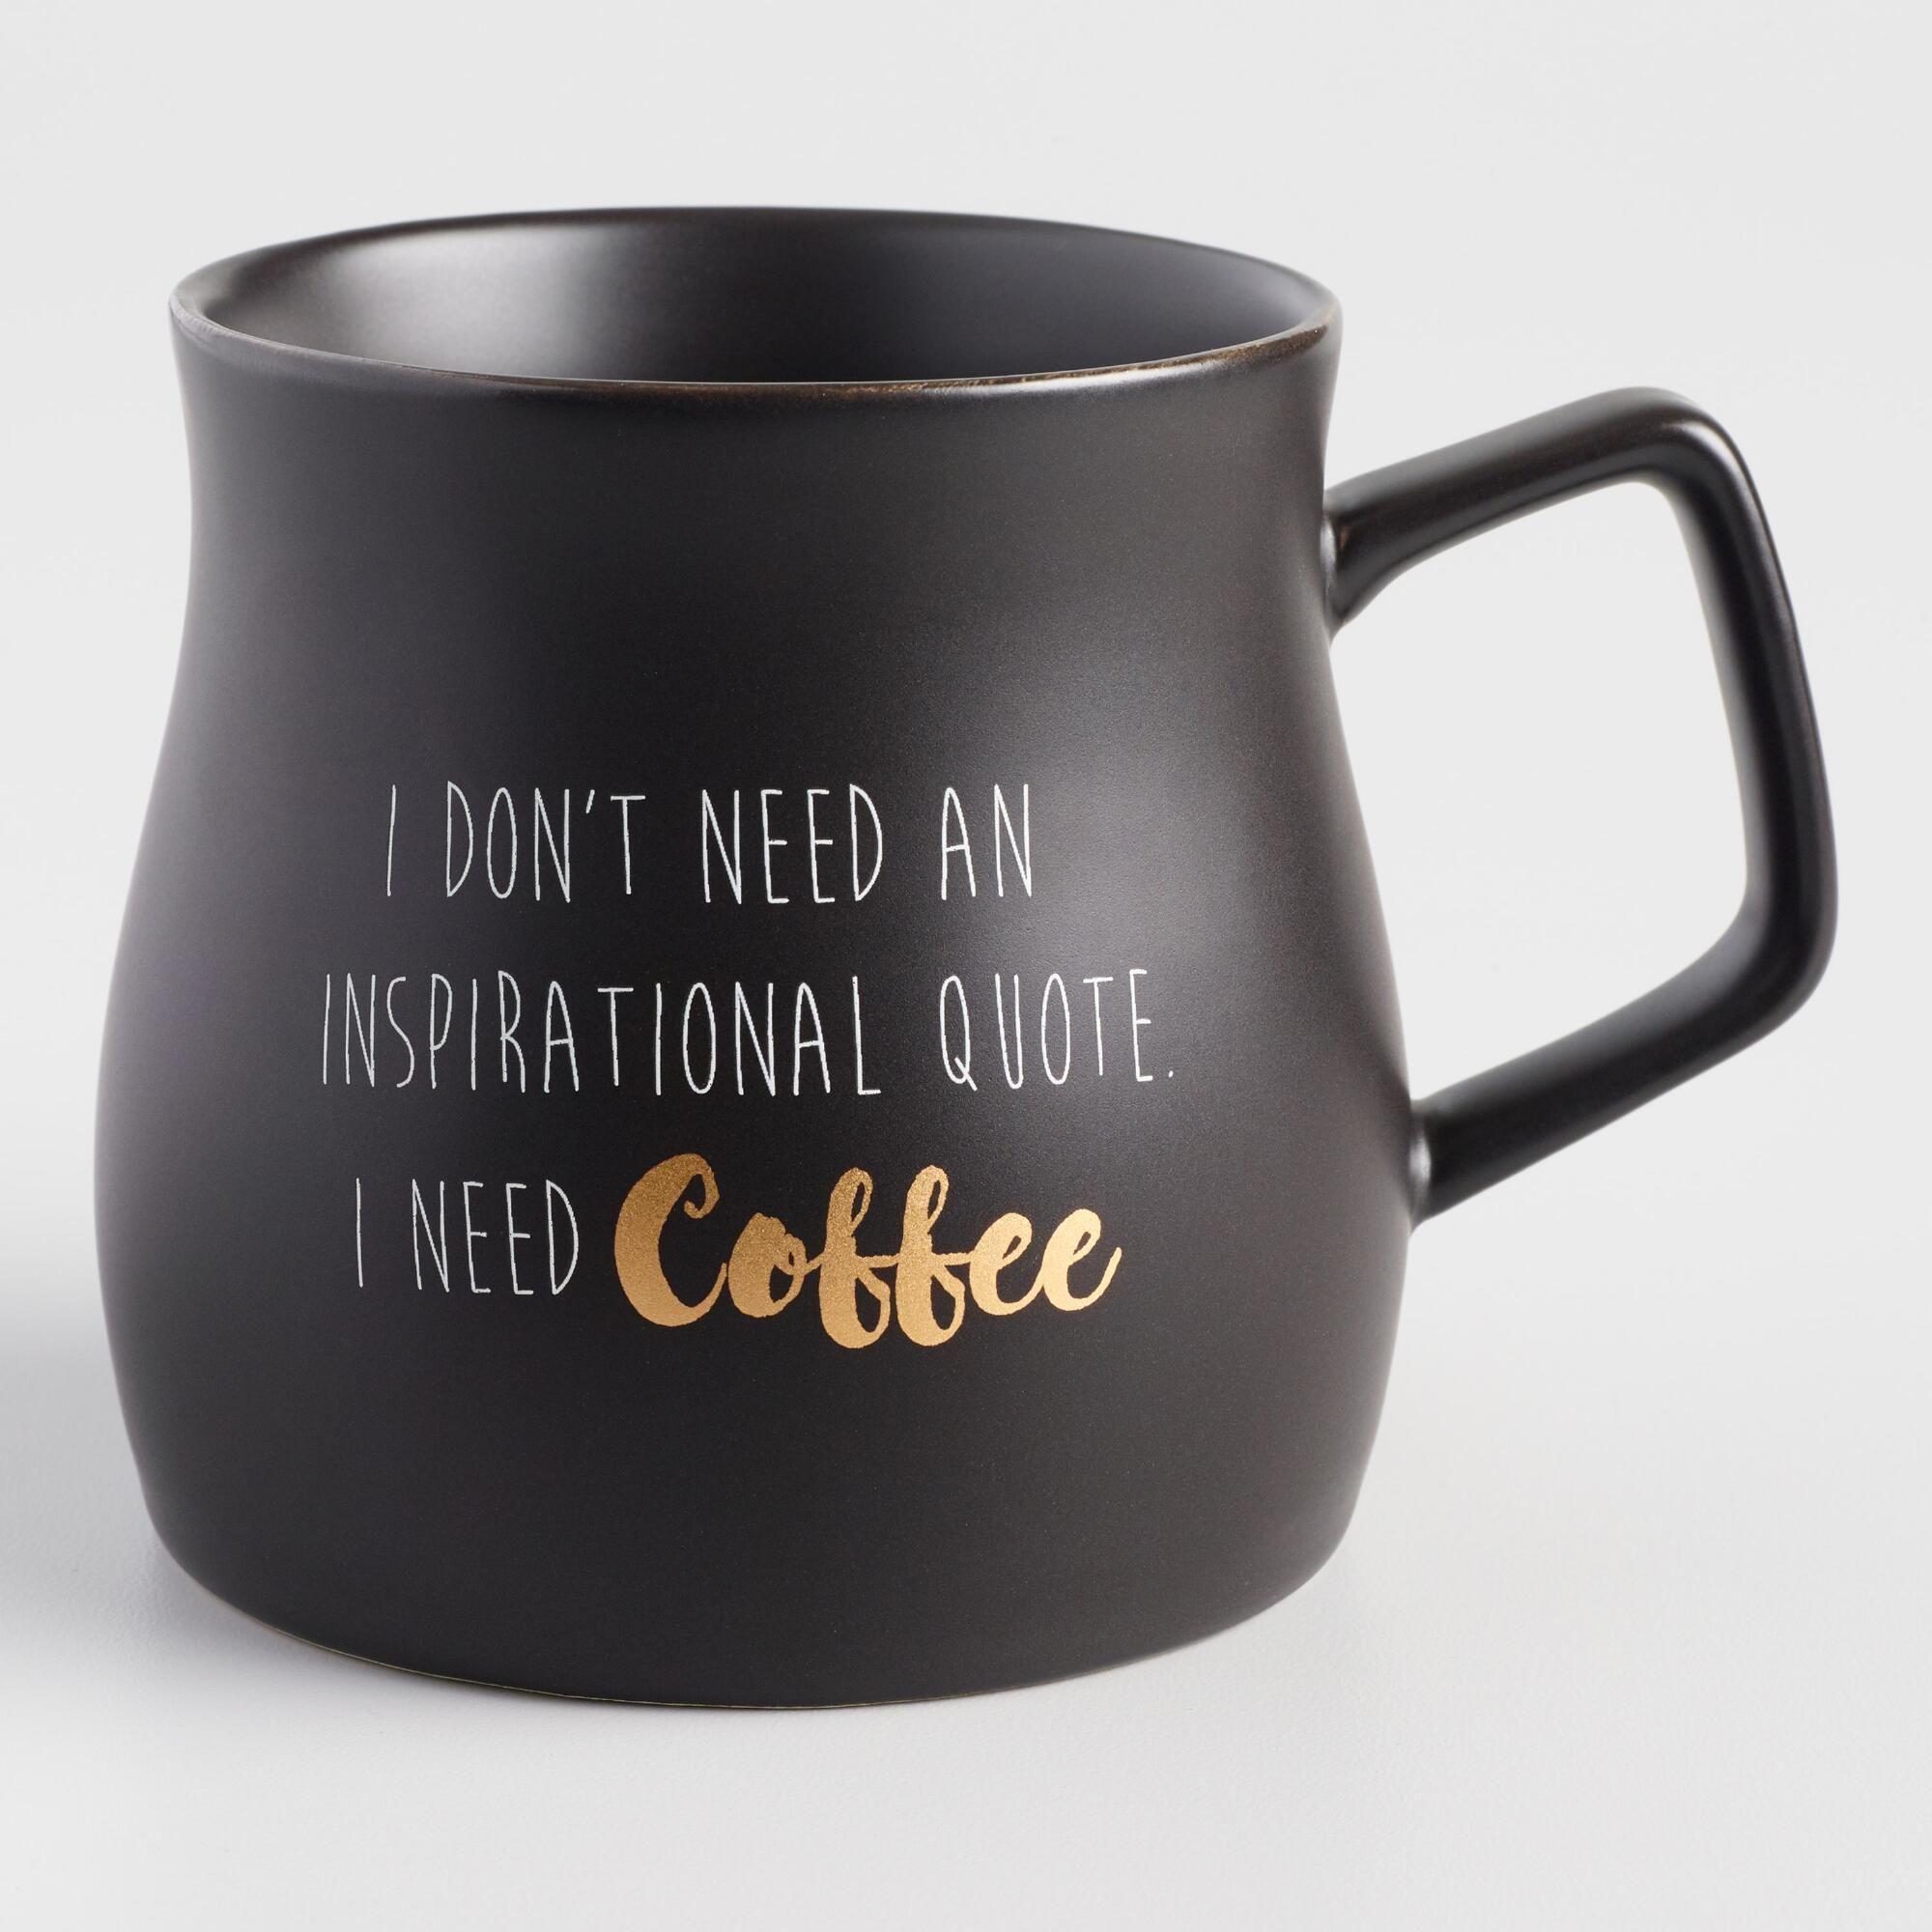 I Need Coffee Quote Tankard Mug by World Market Need